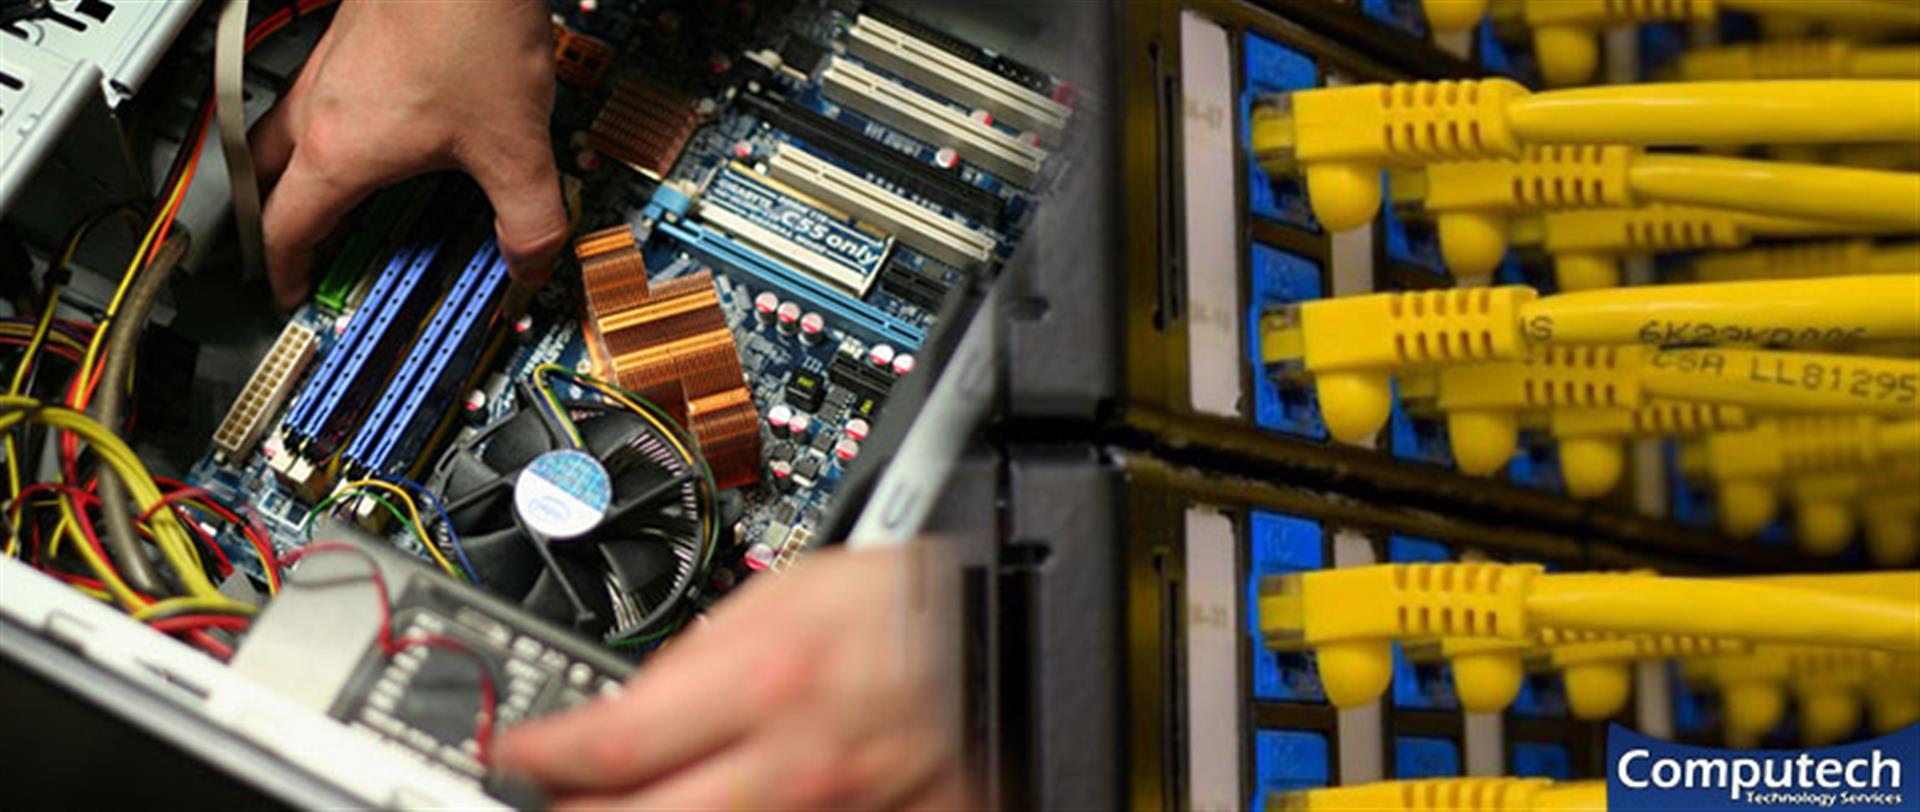 Trussville Alabama Onsite Computer & Printer Repair, Networks, Telecom & Data Wiring Solutions